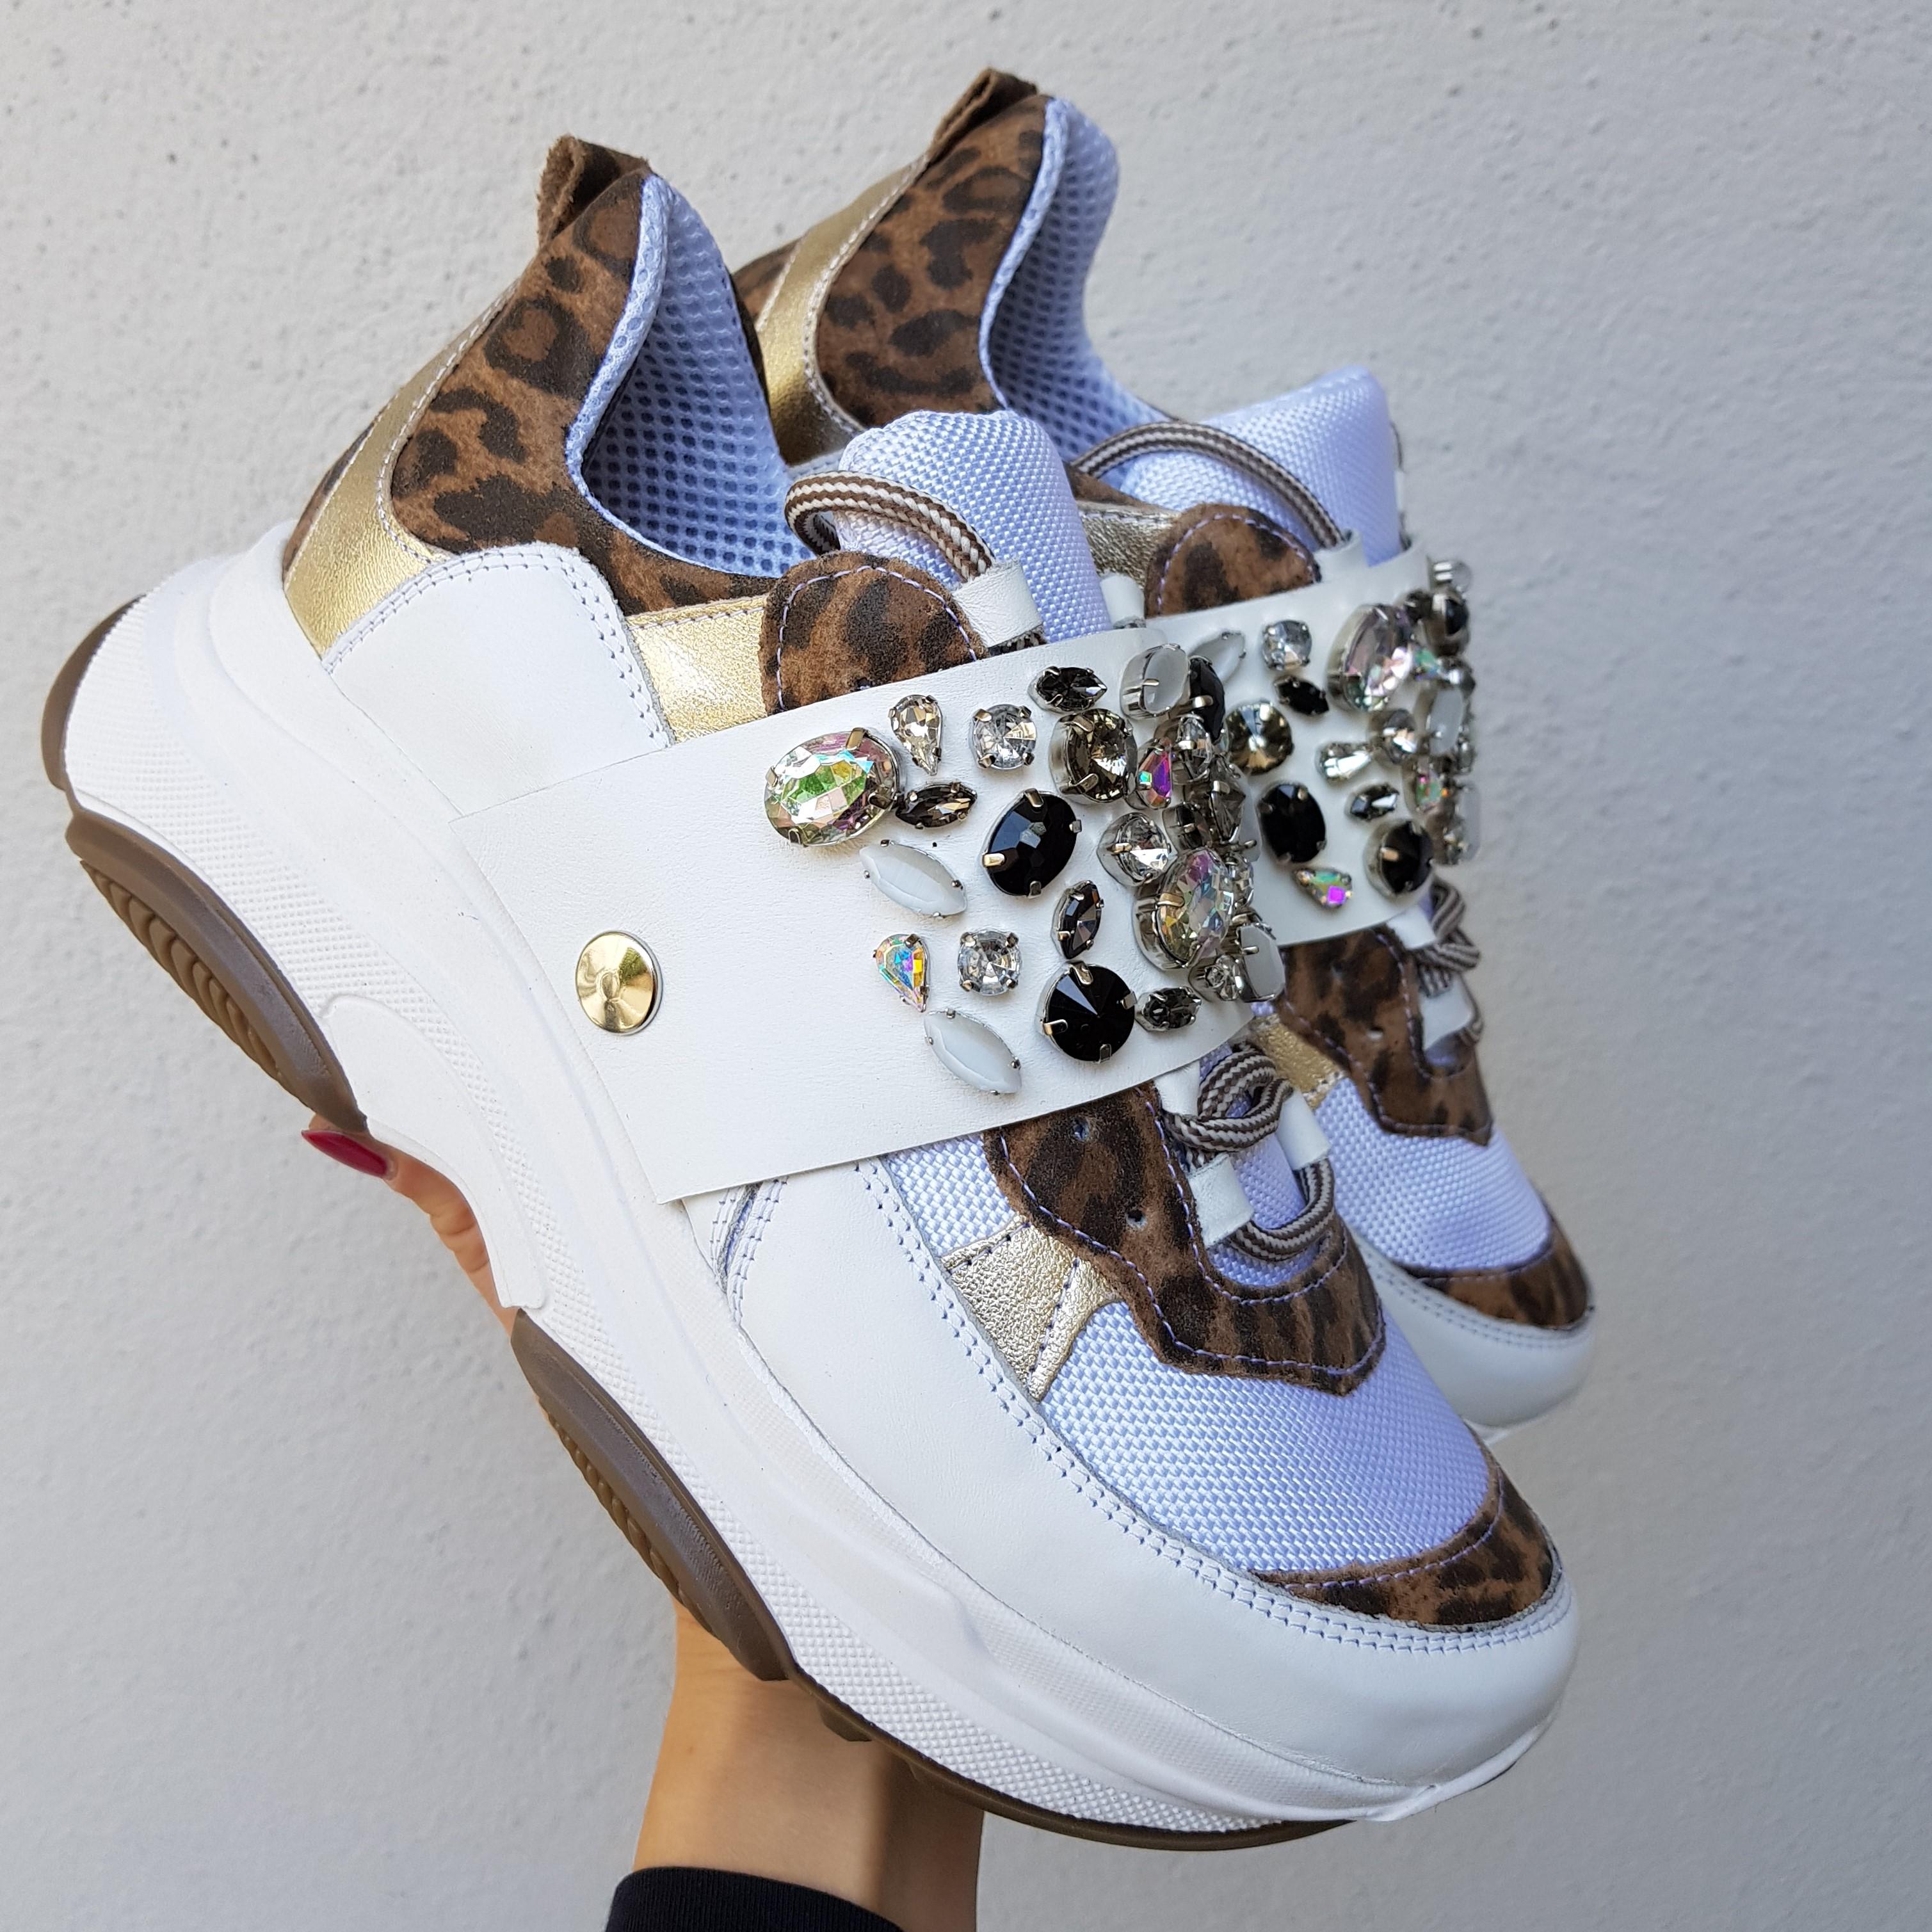 Sneakers pelle bianco e leopardo strass kent4 - Lia diva calzature ...